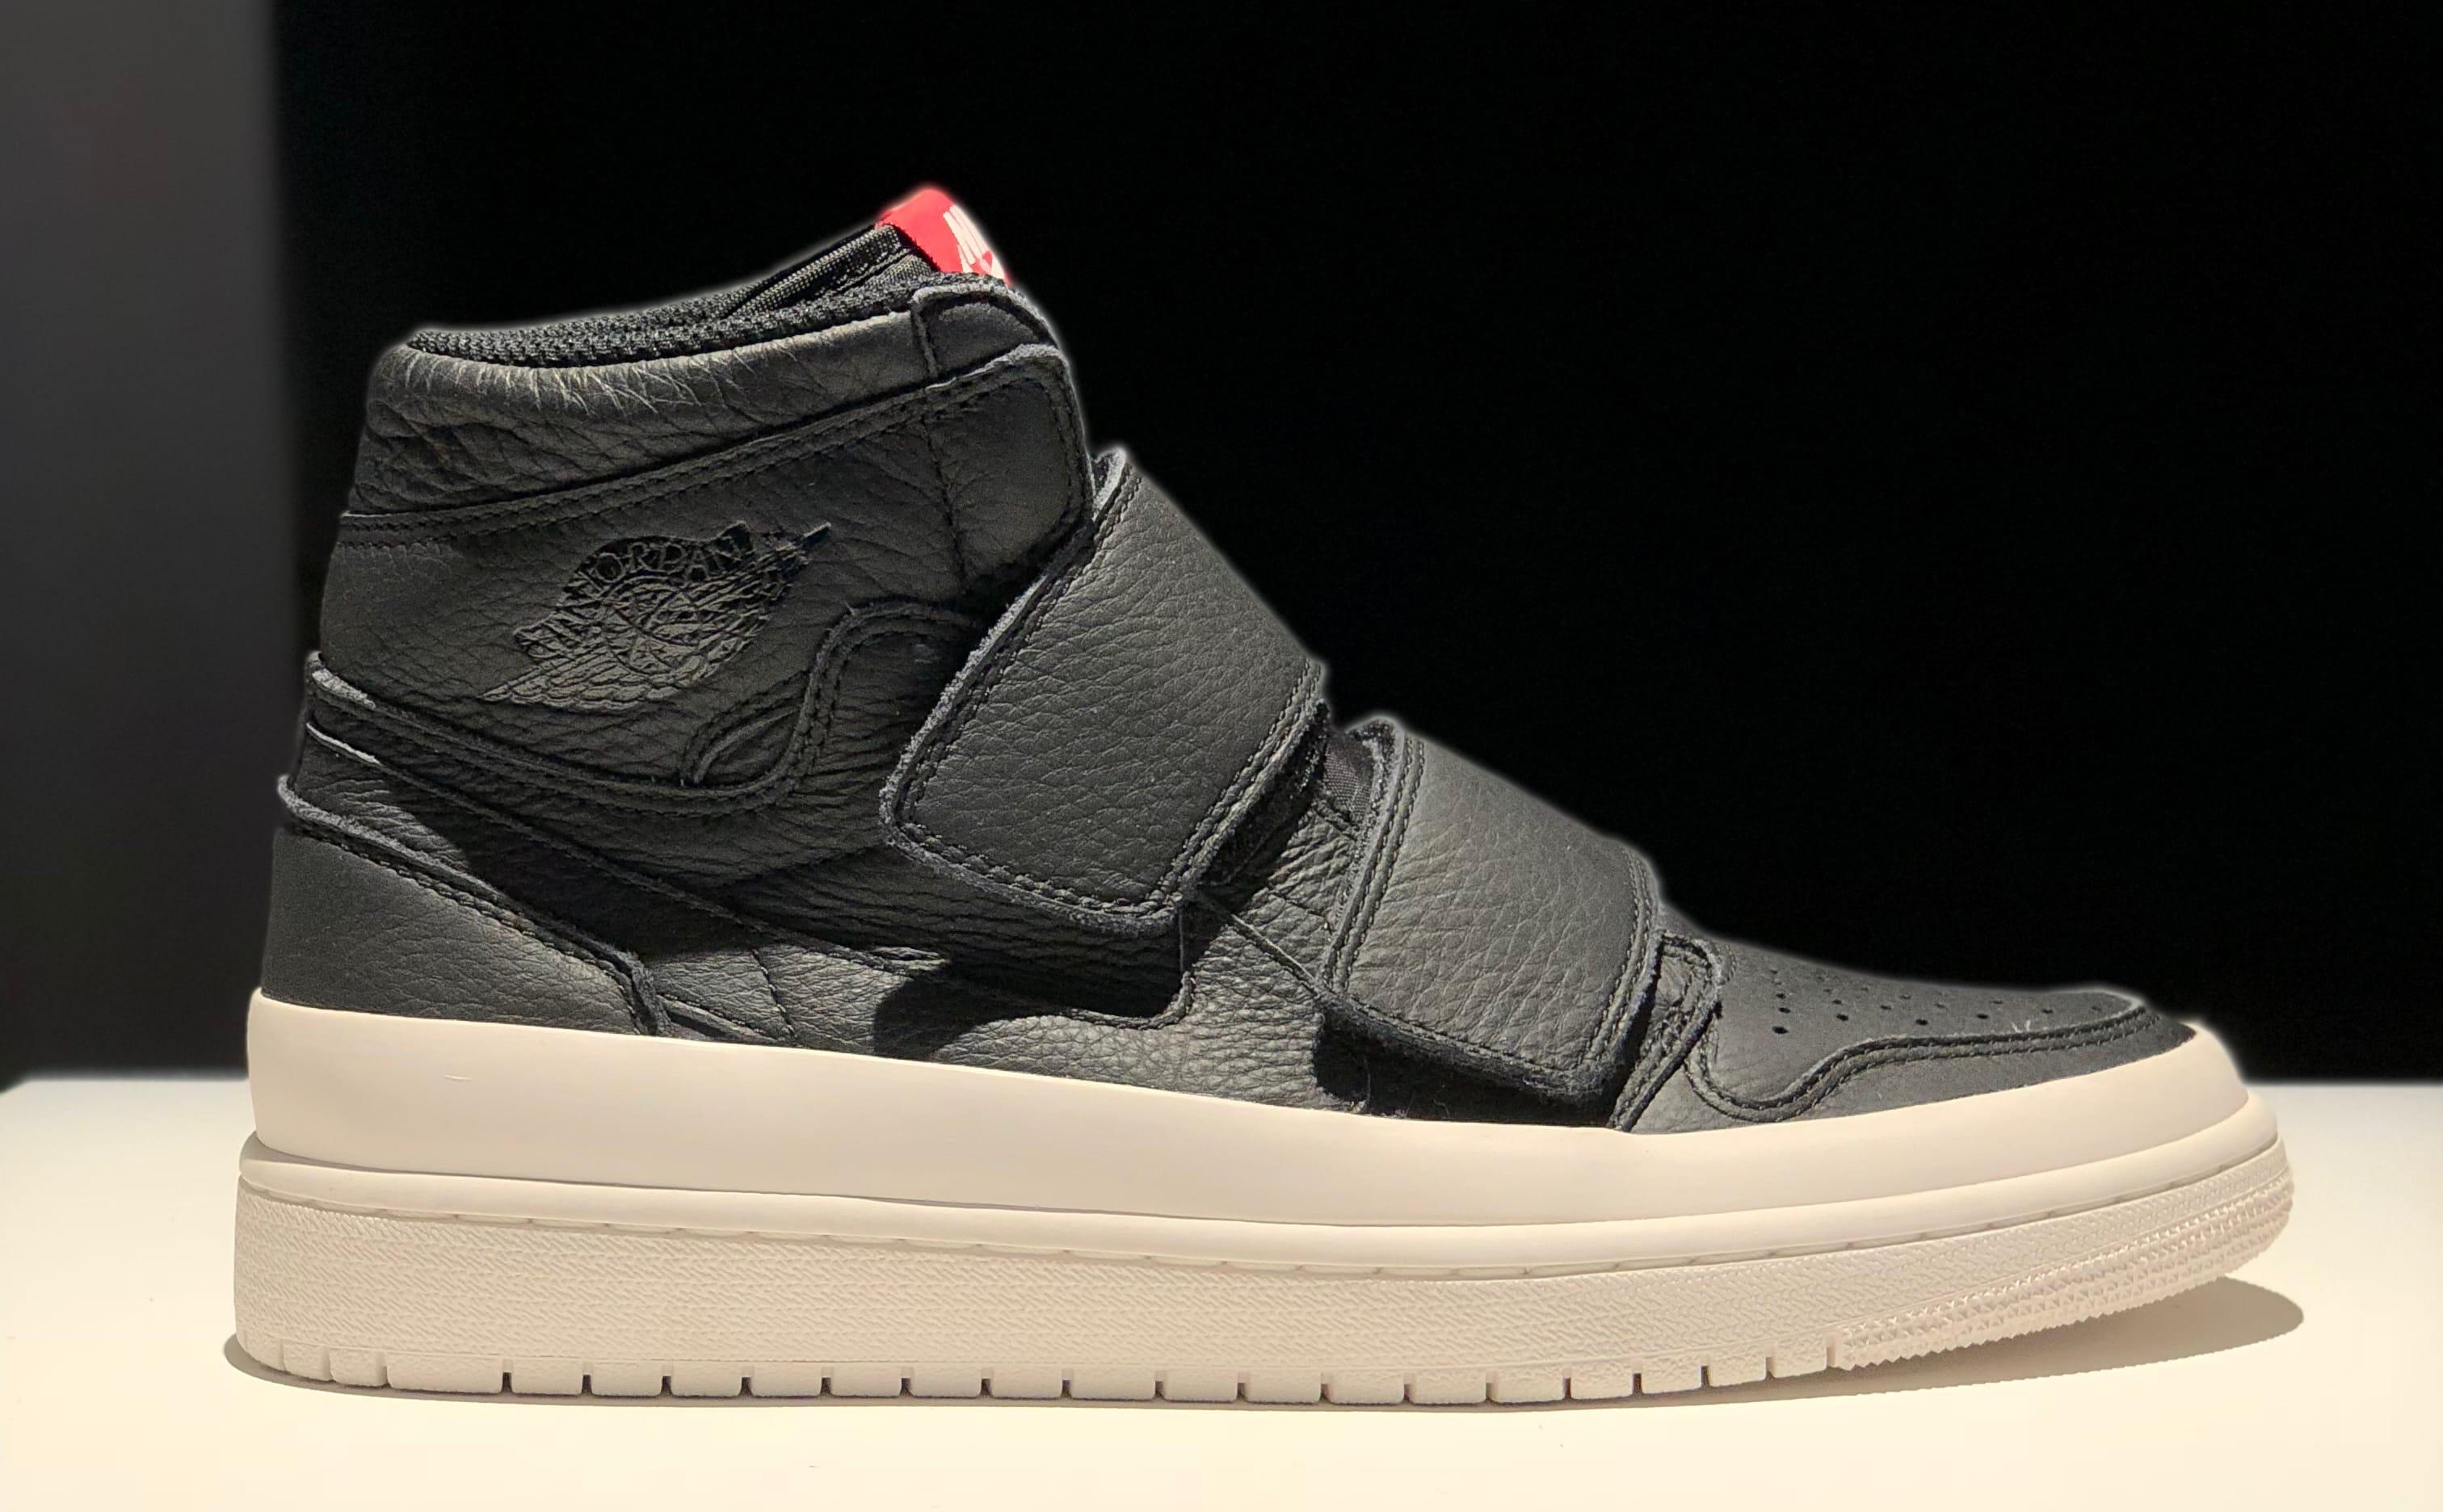 Air Jordan 1 High Velcro Men's Black